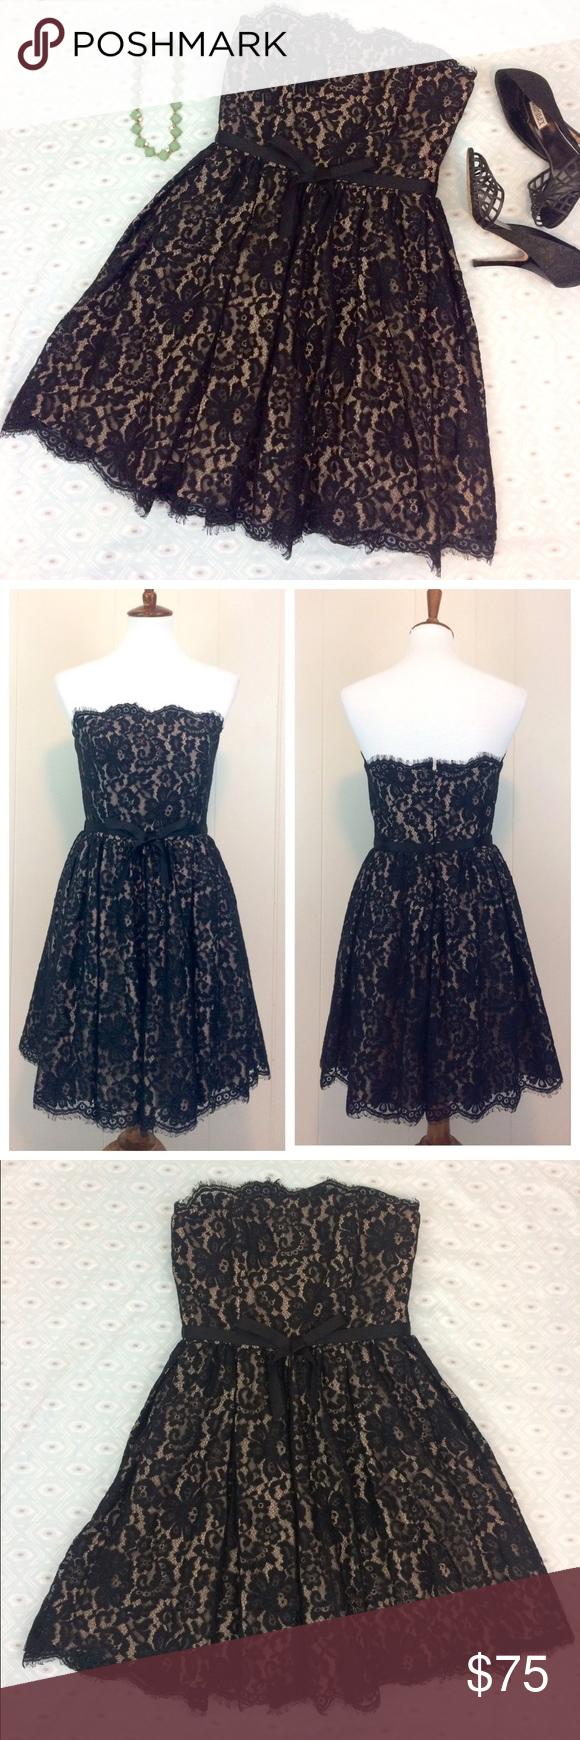 Black dress neiman marcus - Neiman Marcus Robert Rodriguez Lace Party Dress Nwt